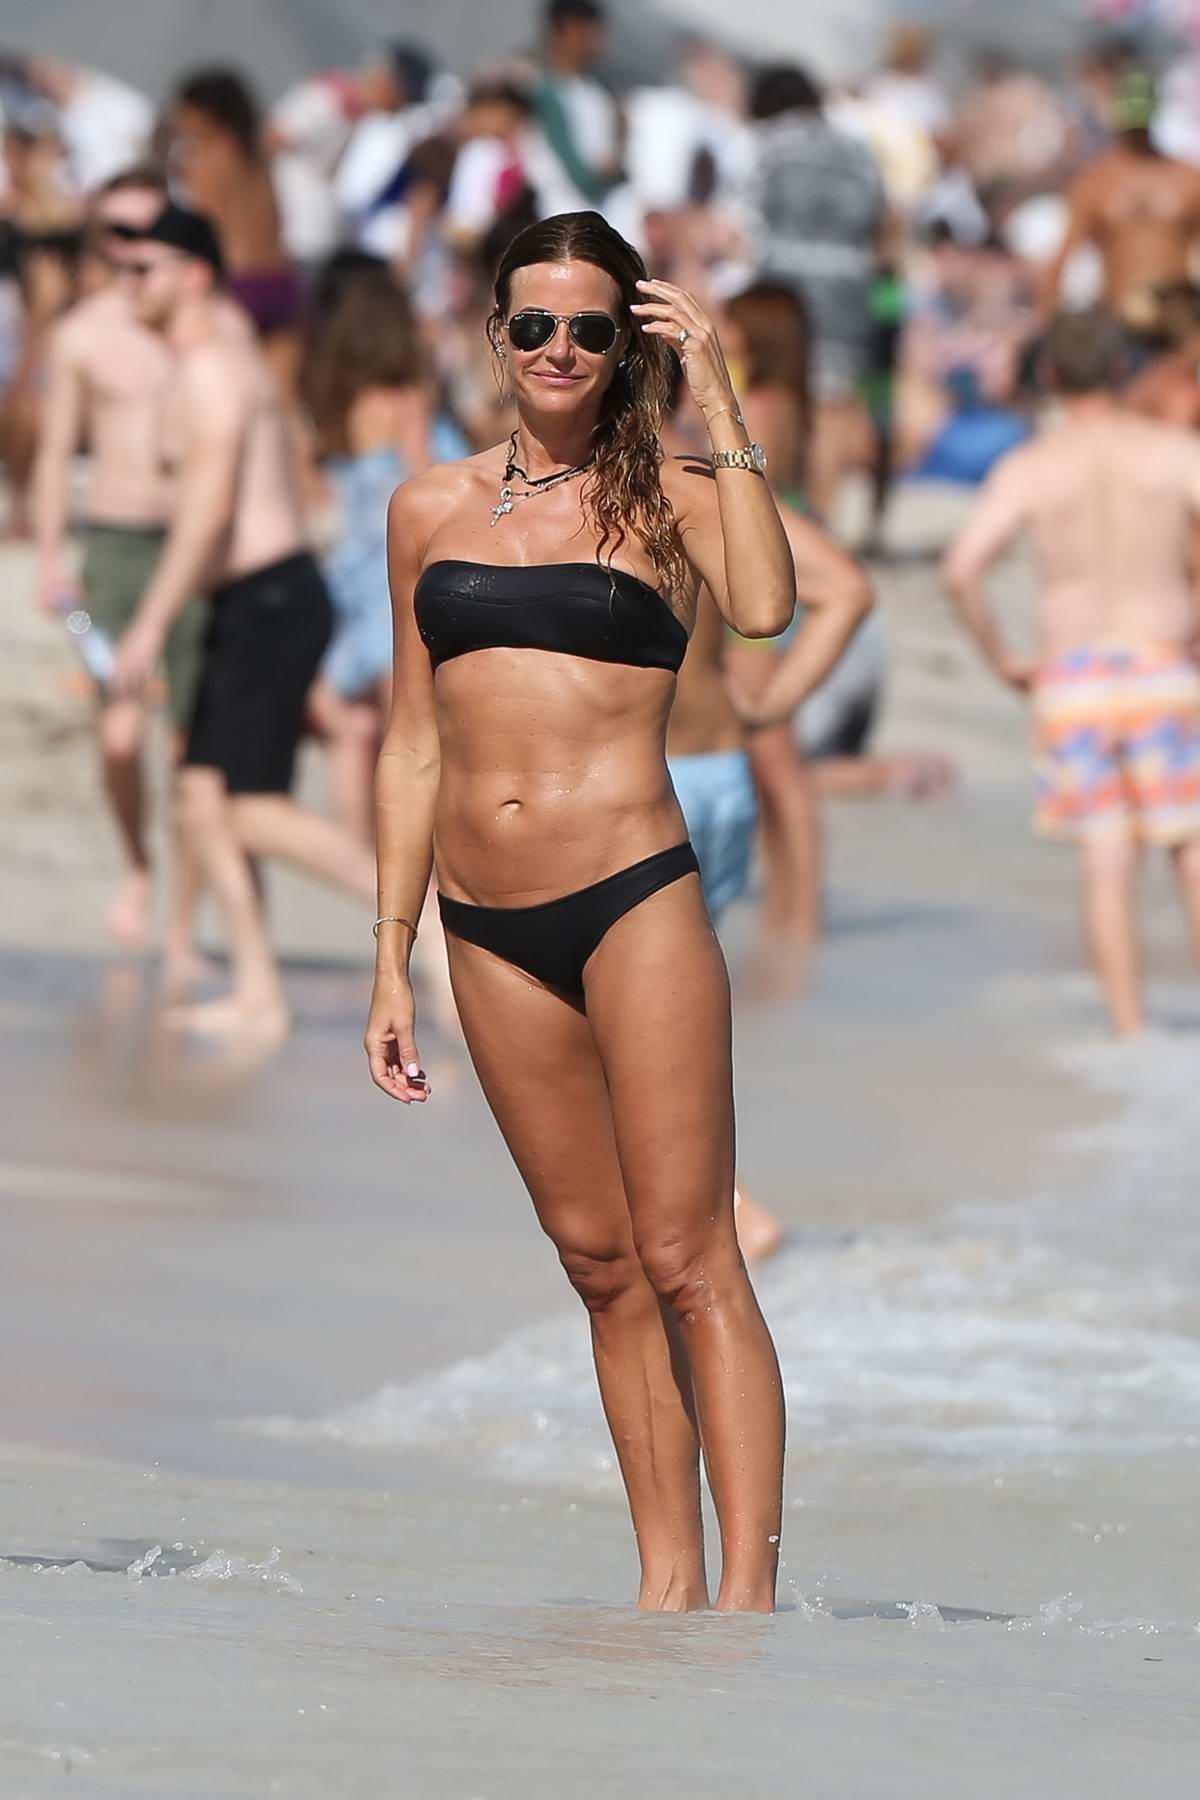 Kelly Bensimon hits the beach in a black bikini in Miami, Florida